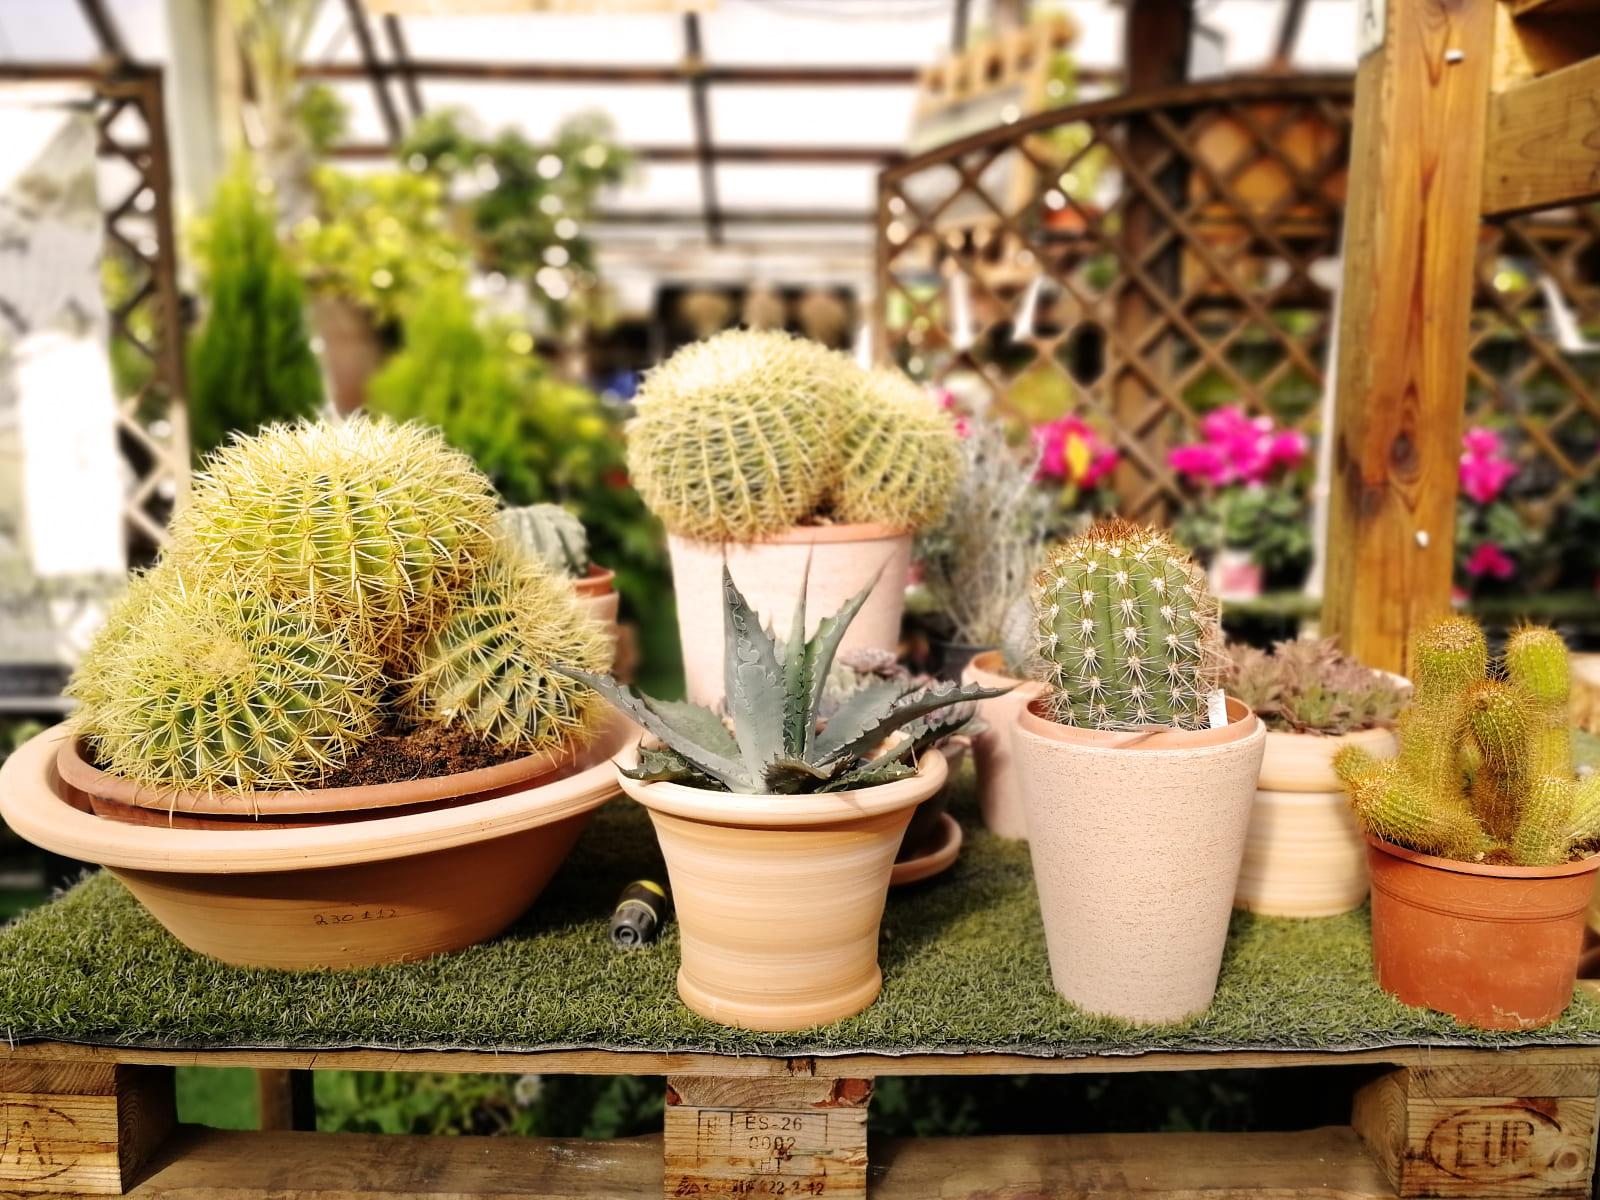 centro-jardineria-garden-invernadero-artesanal-madera-fuente-16_HIDROJARDIN-Bañeres